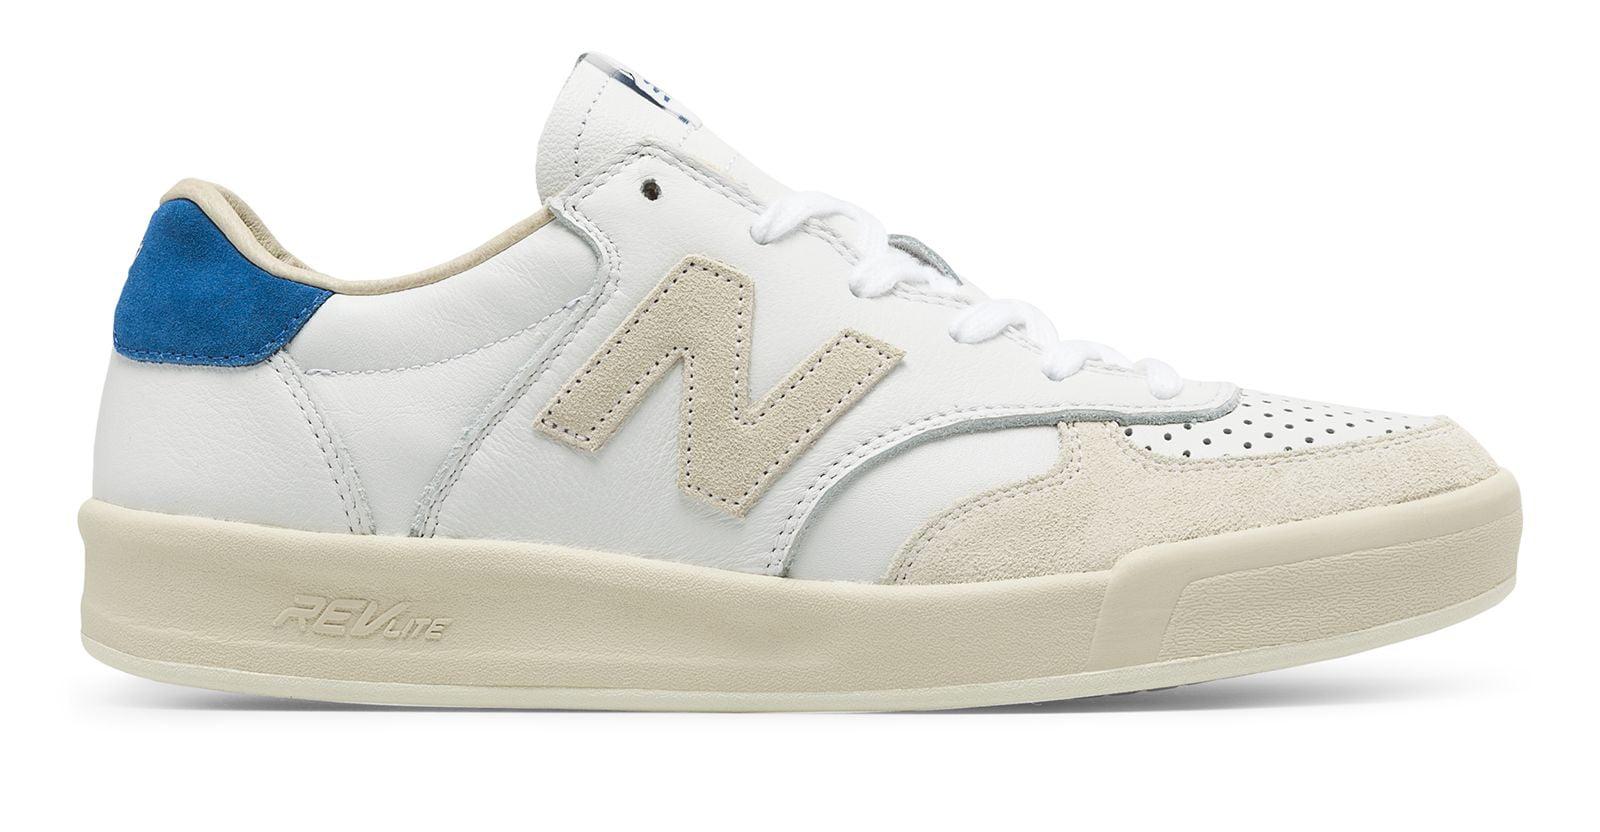 Balance Men's 300 Leather Shoes White